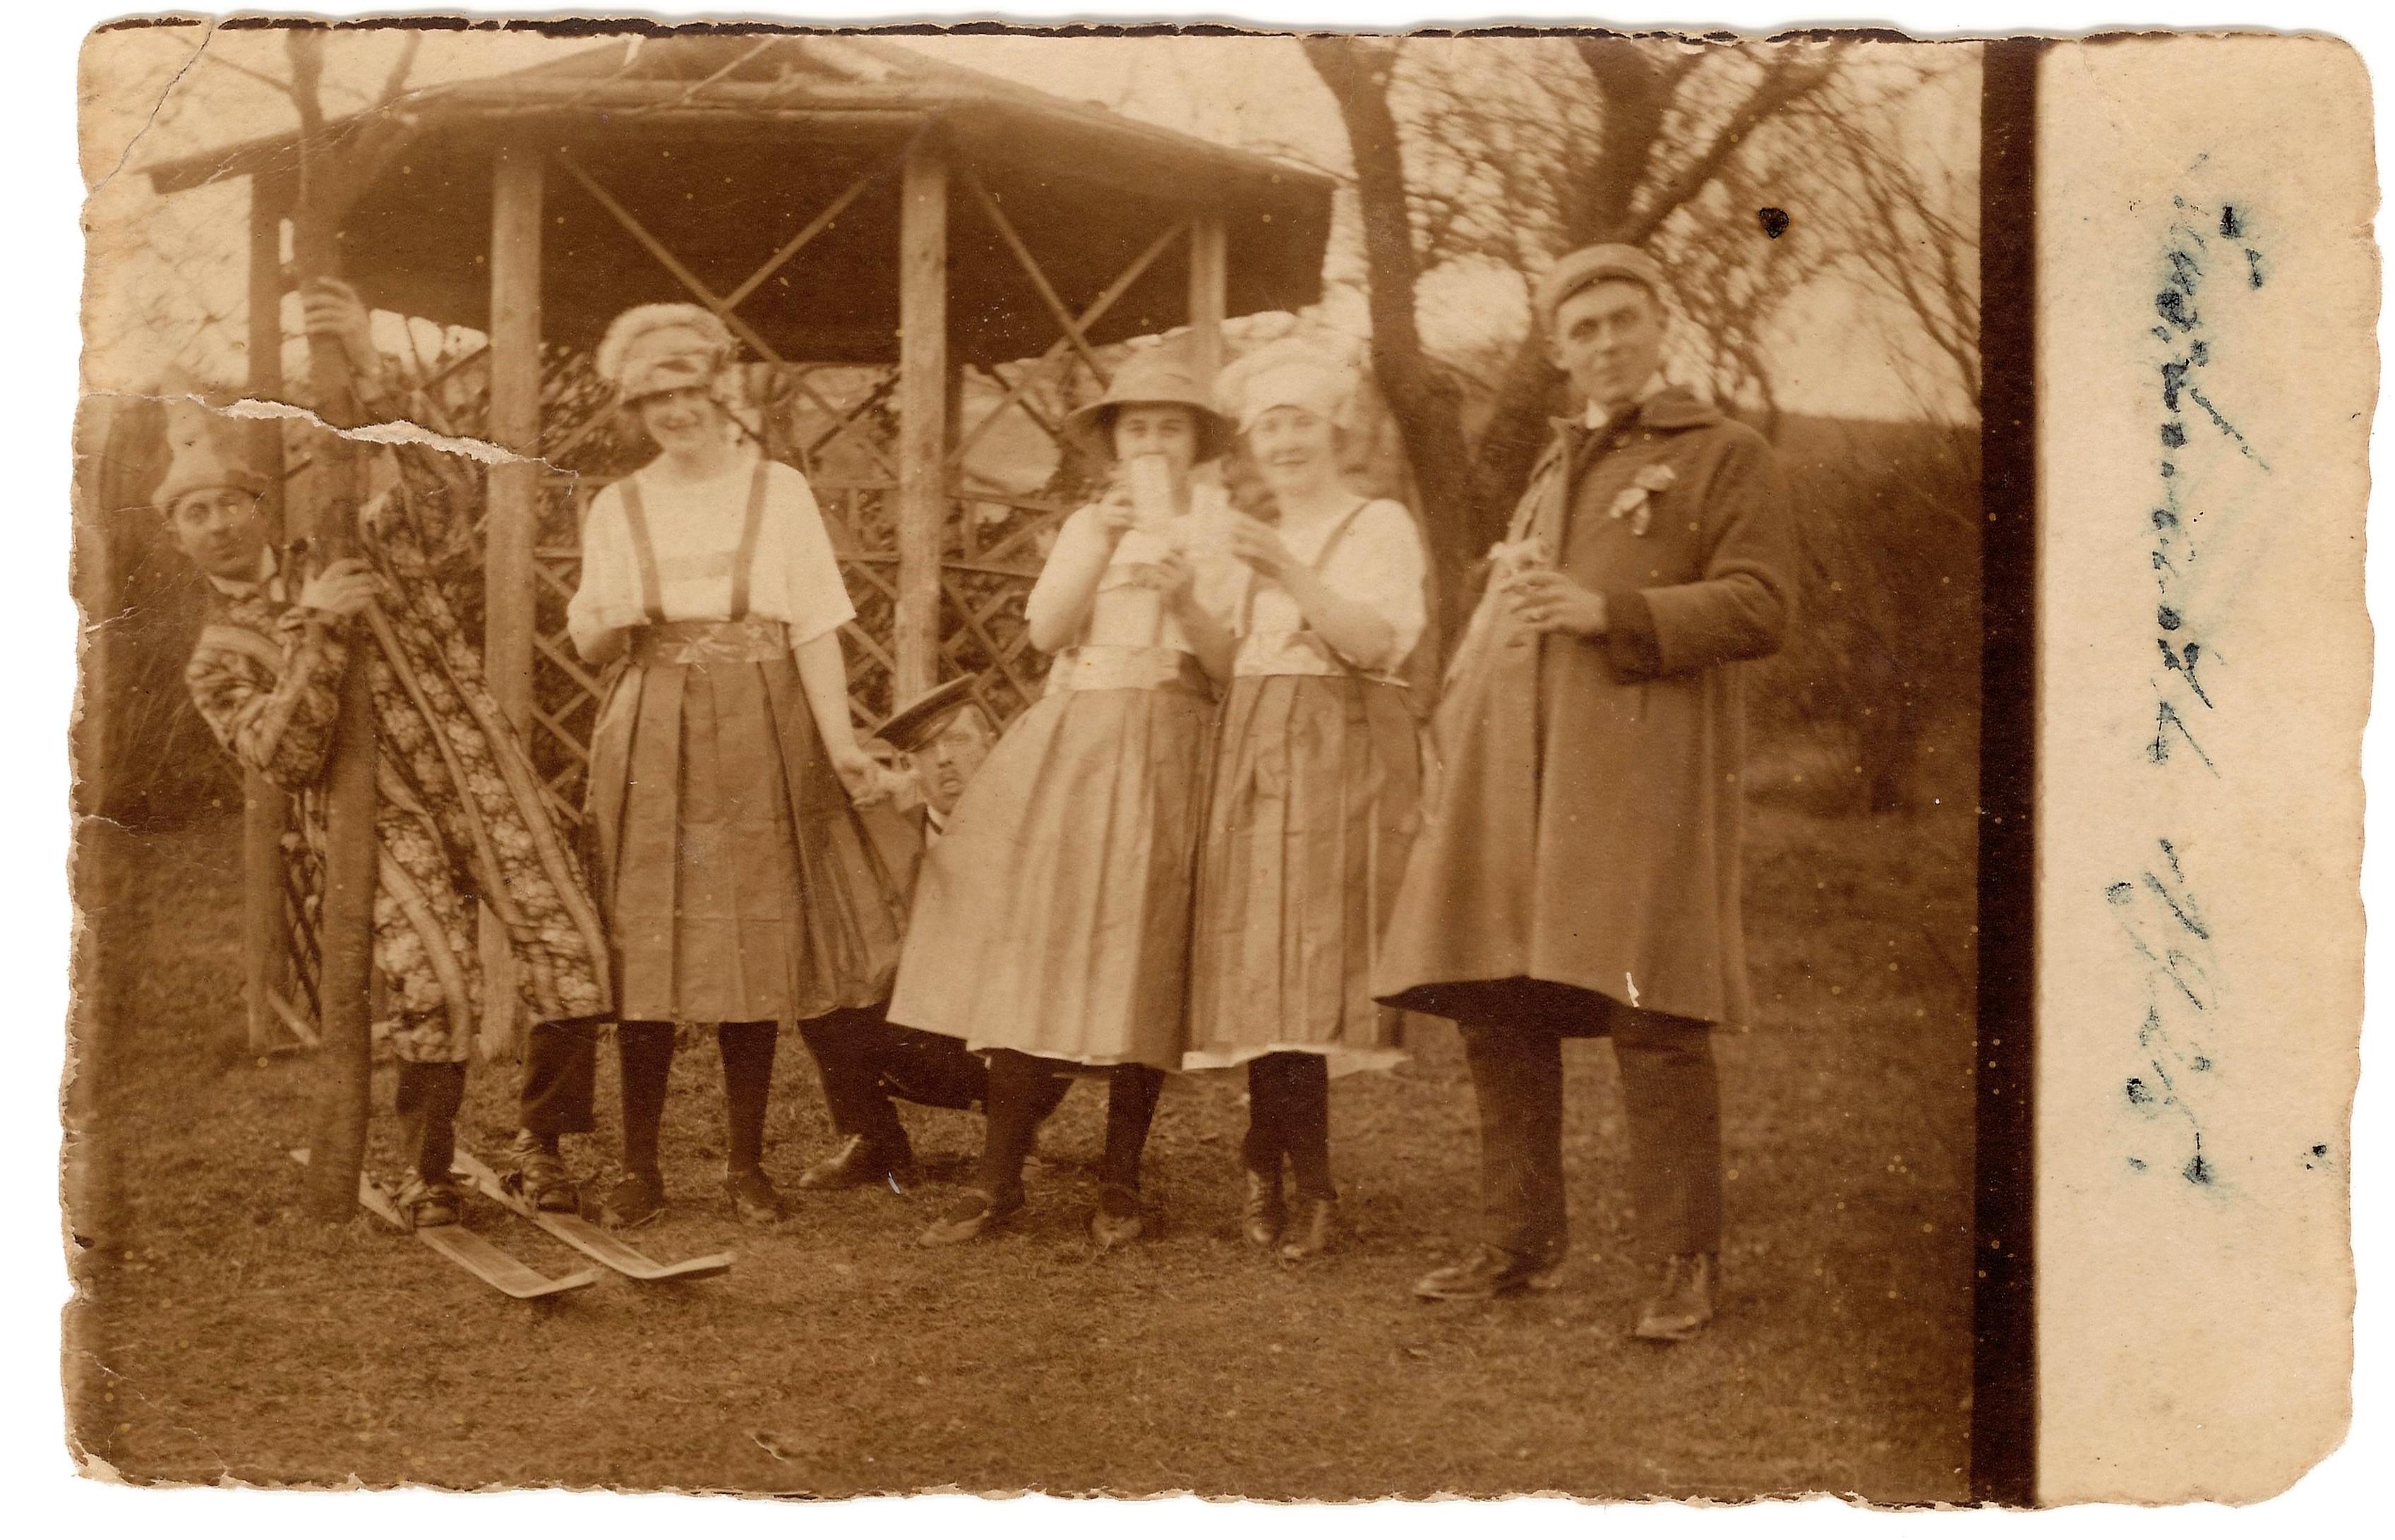 1925 Karneval draußen